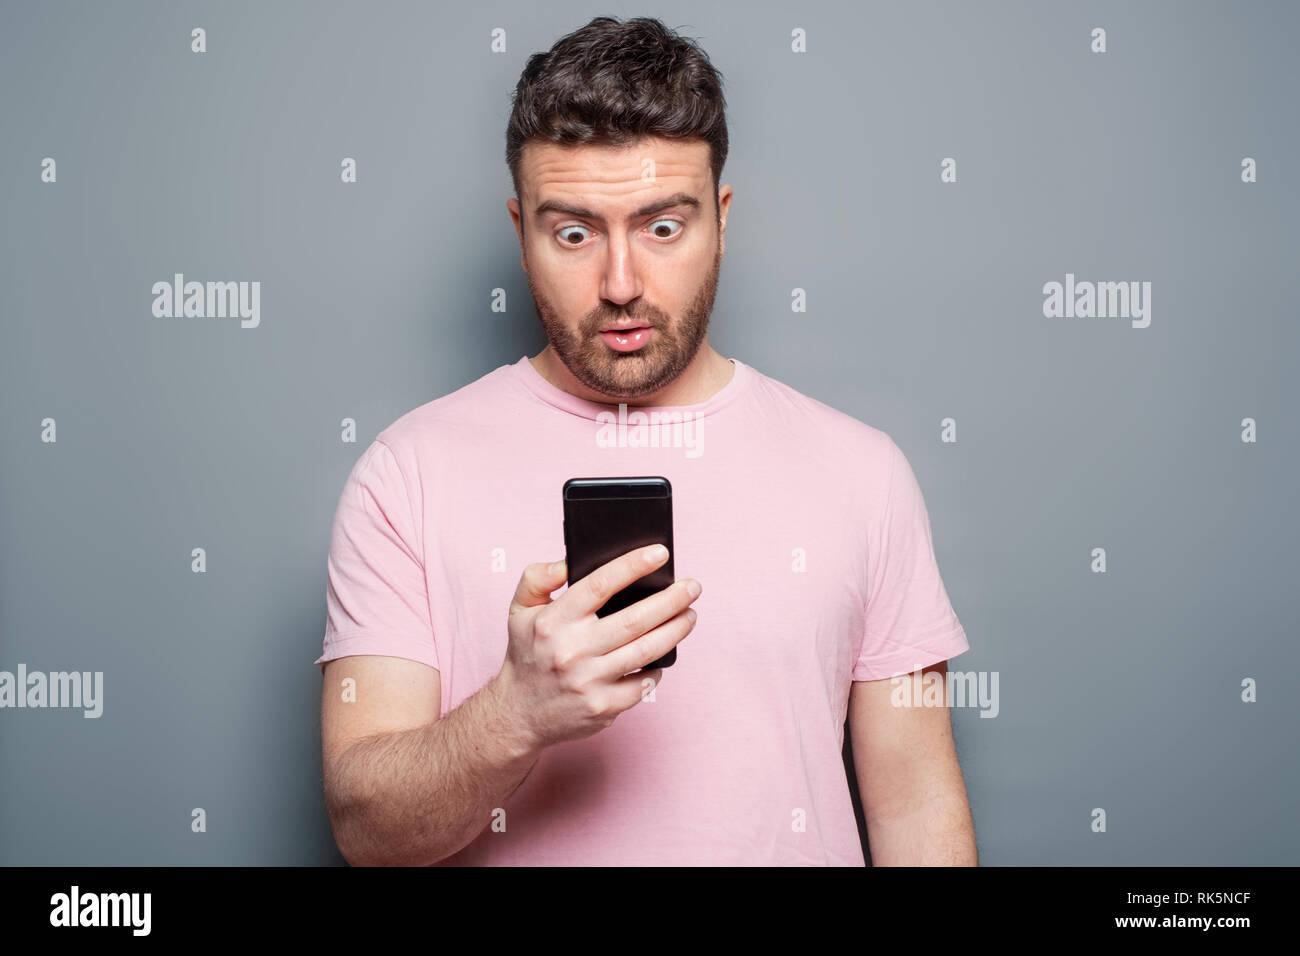 Surprised man portrait watching smartphone display - Stock Image